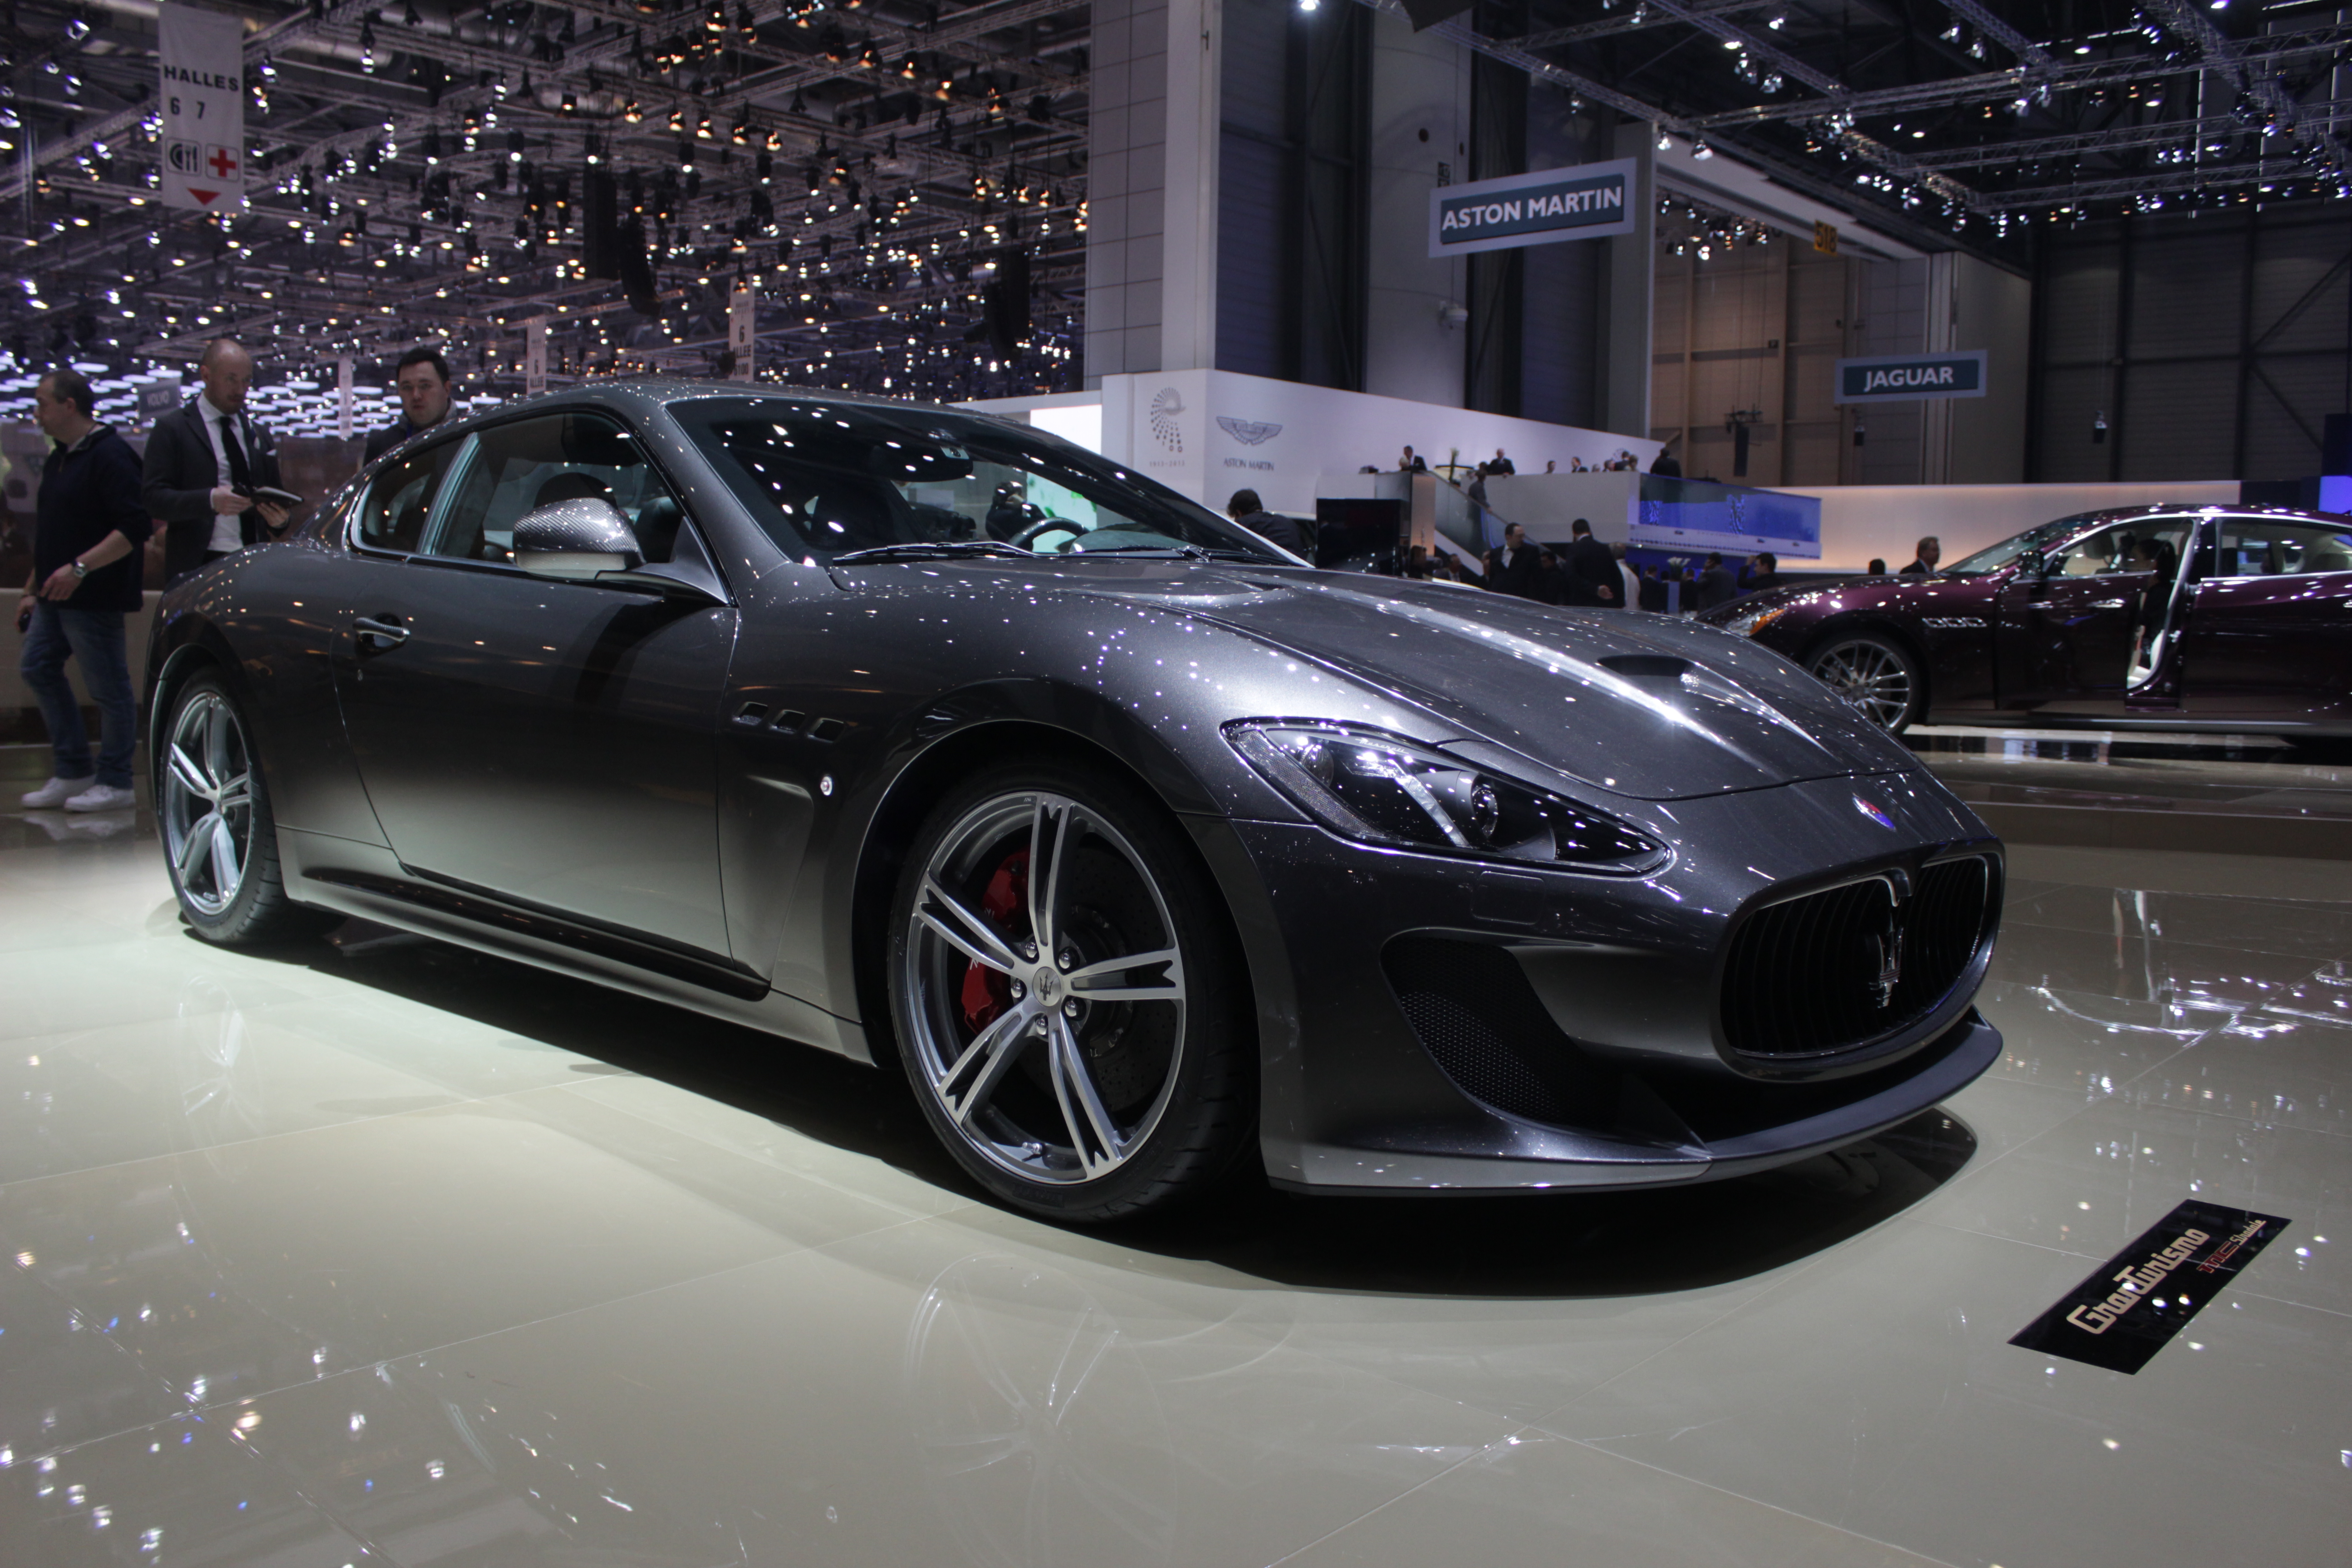 http://images.caradisiac.com/images/4/9/5/8/84958/S0-En-direct-du-Salon-de-Geneve-2013-Maserati-GranTurismo-MC-Stradale-deux-de-plus-287959.jpg